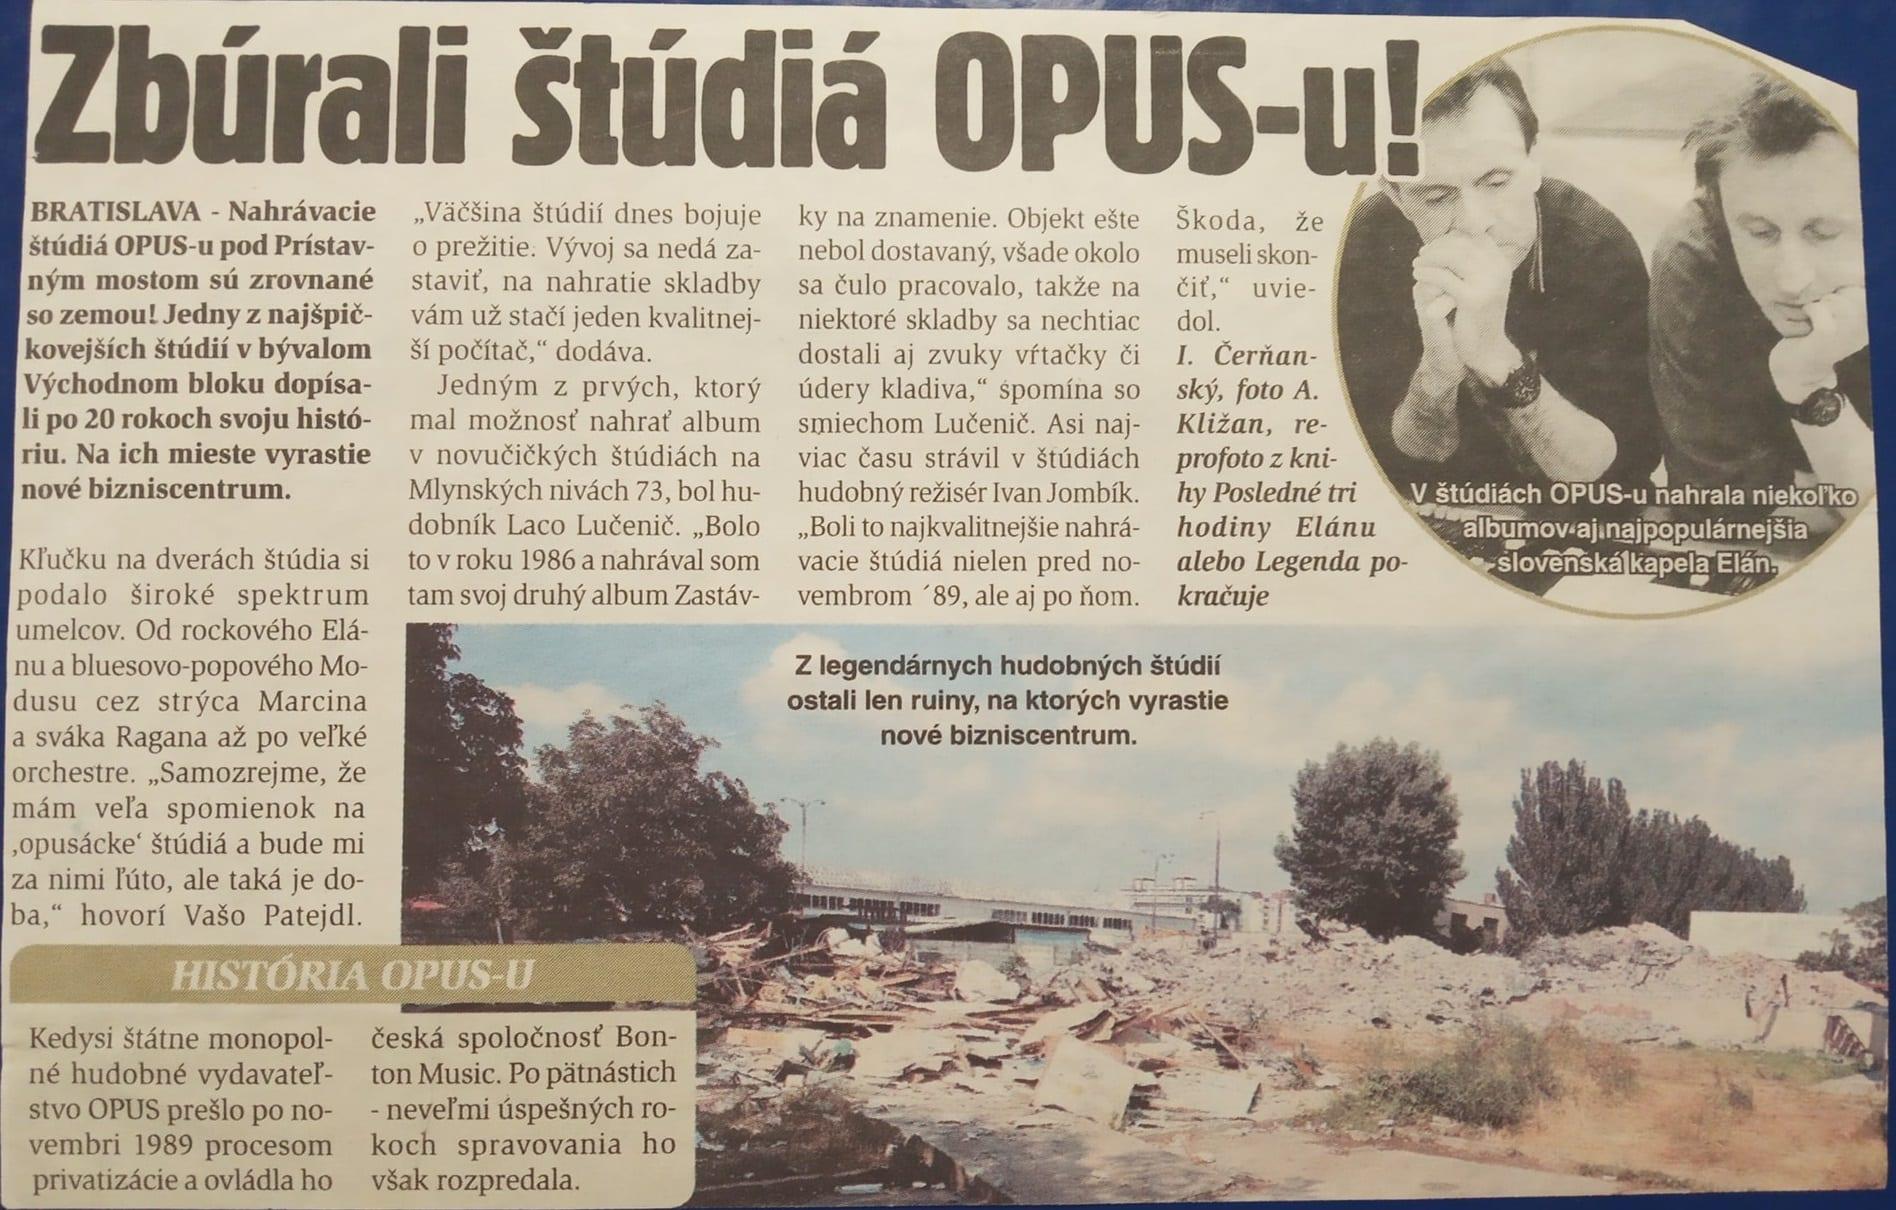 Zbúrali štúdiá OPUS-u